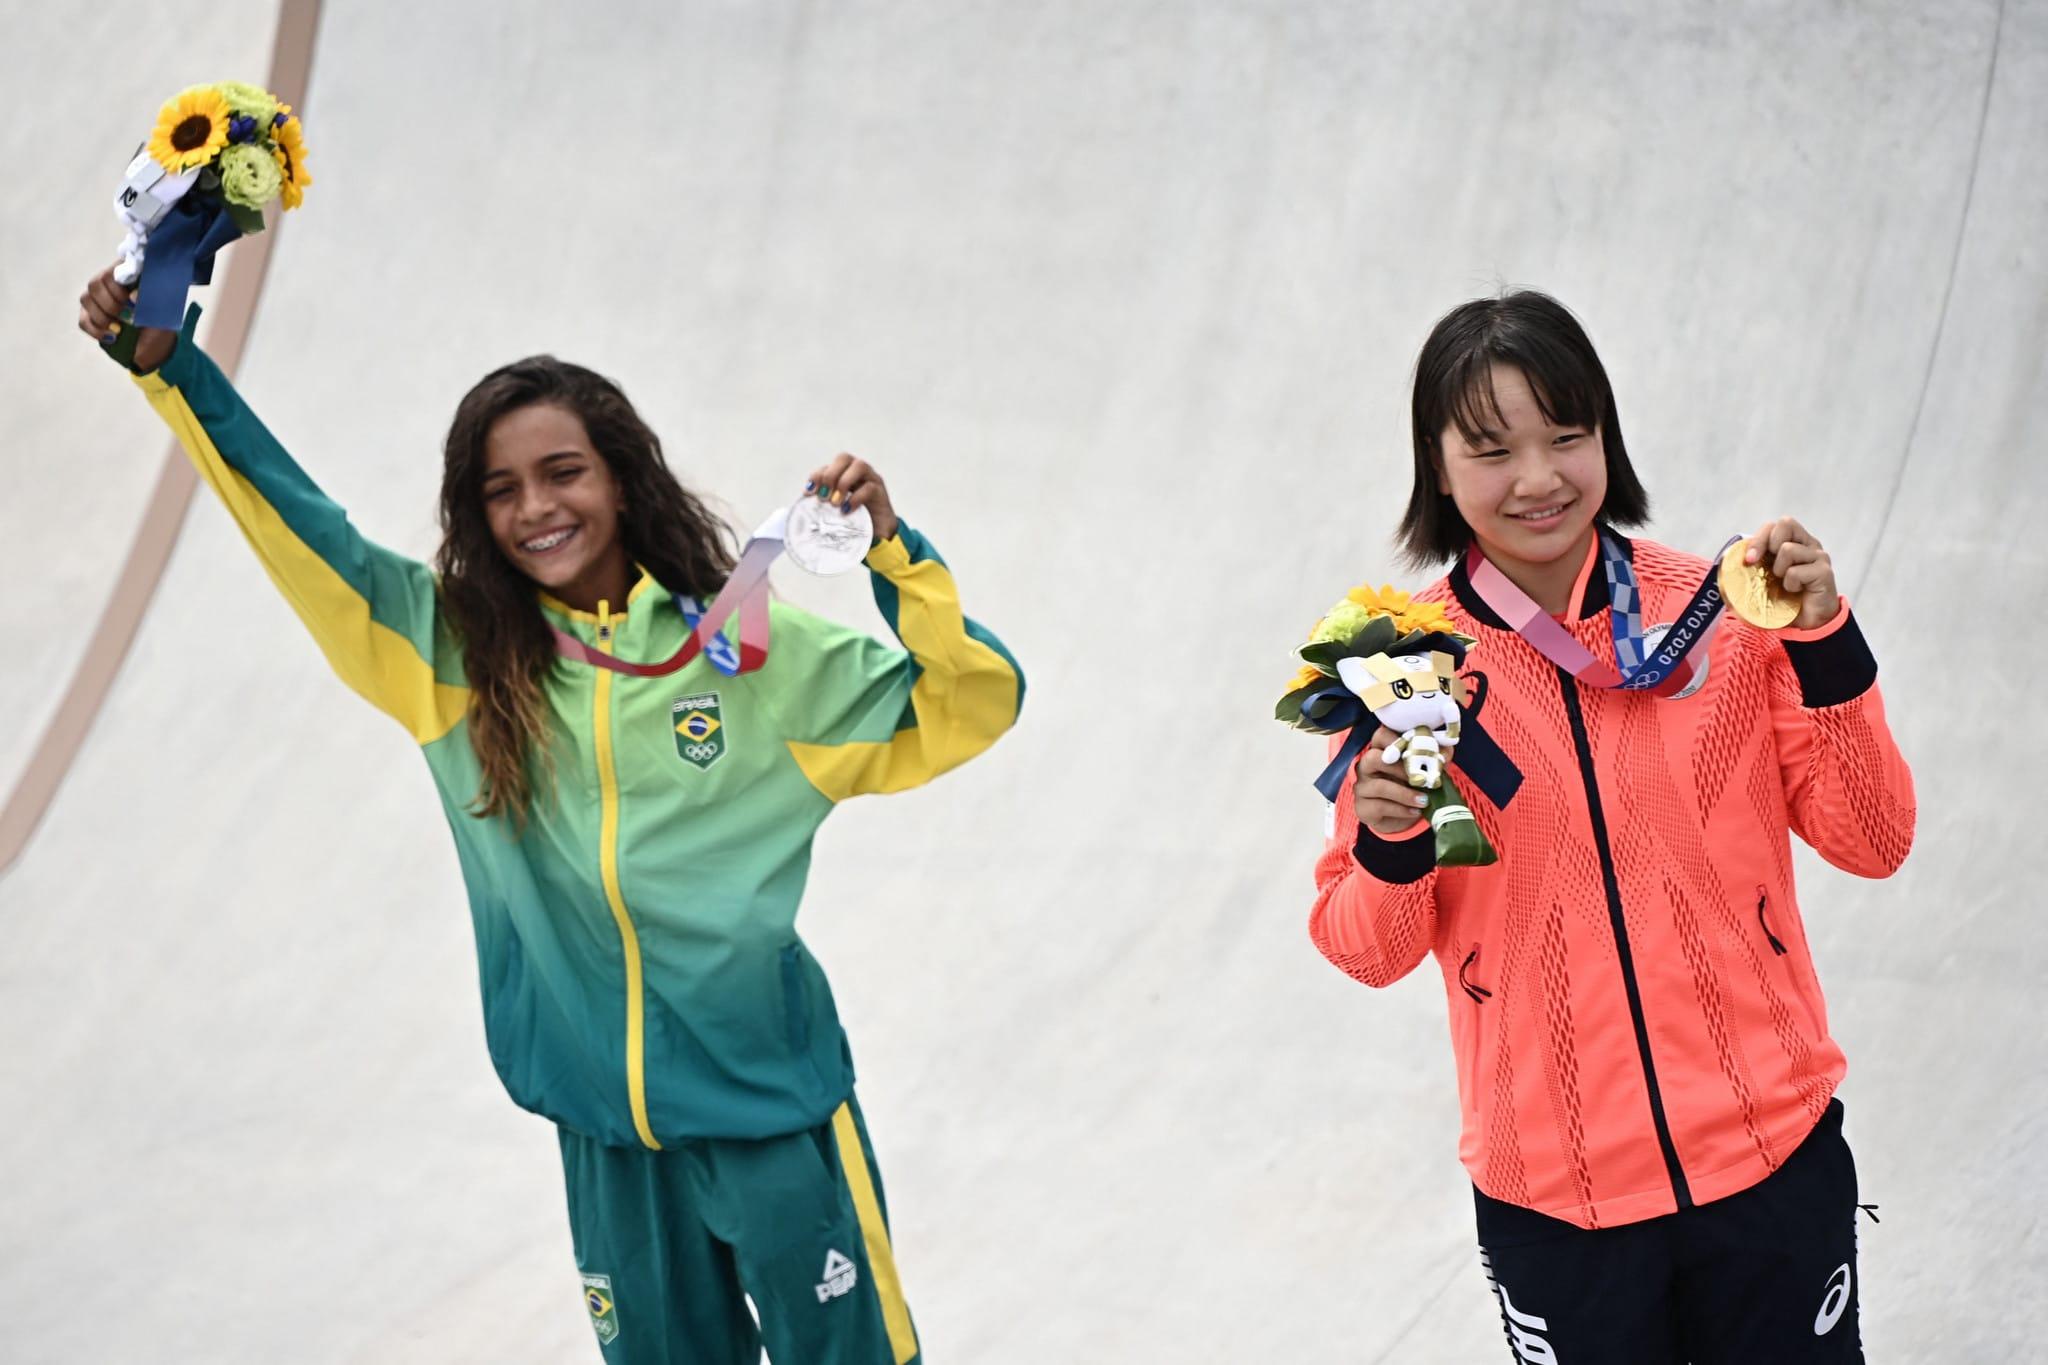 Medalhistas do Skate Street Feminino